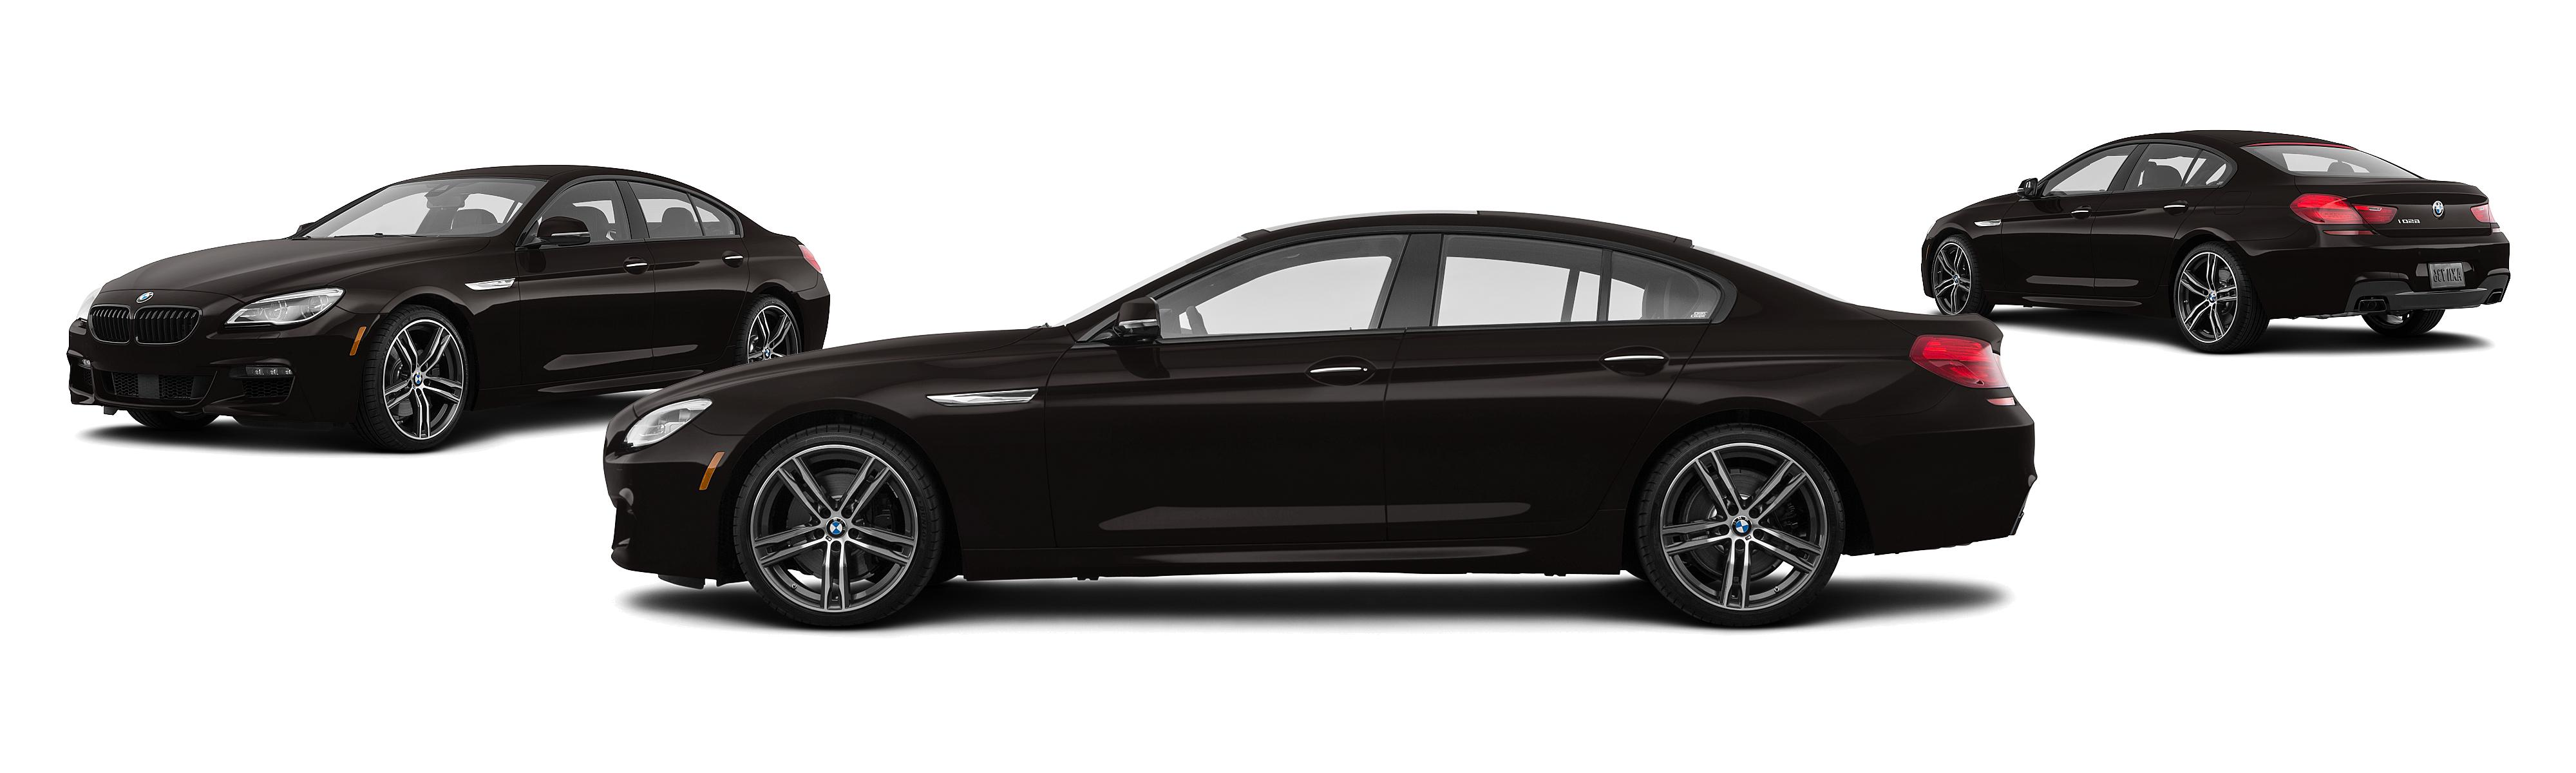 2019 bmw 6 series awd alpina b6 xdrive gran coupe 4dr sedan rh groovecar com